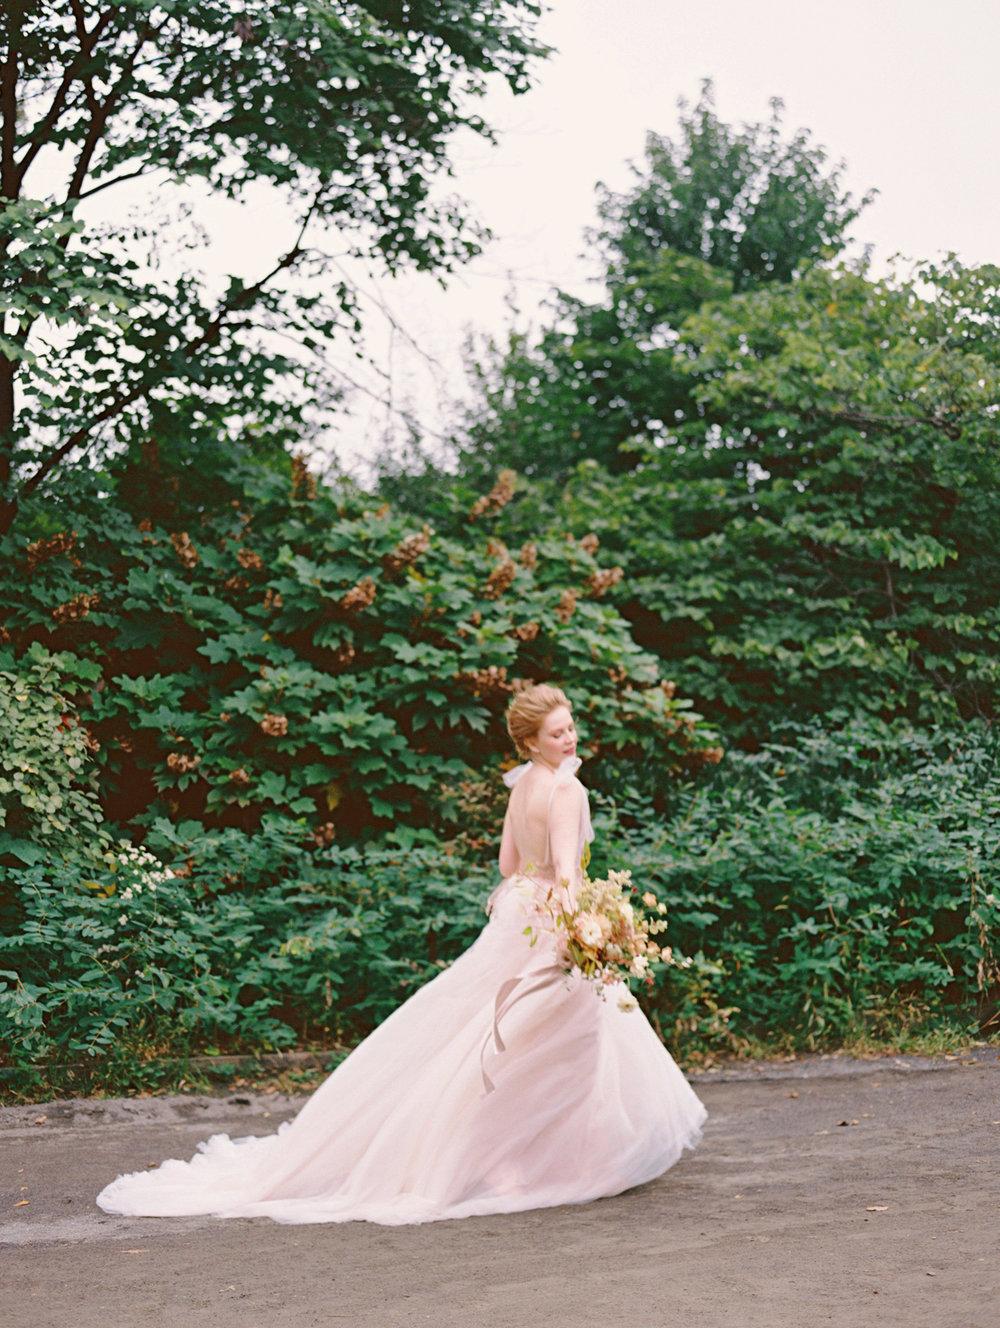 kelsandmichael_bridaleditorial_harvestelopement-39.jpg